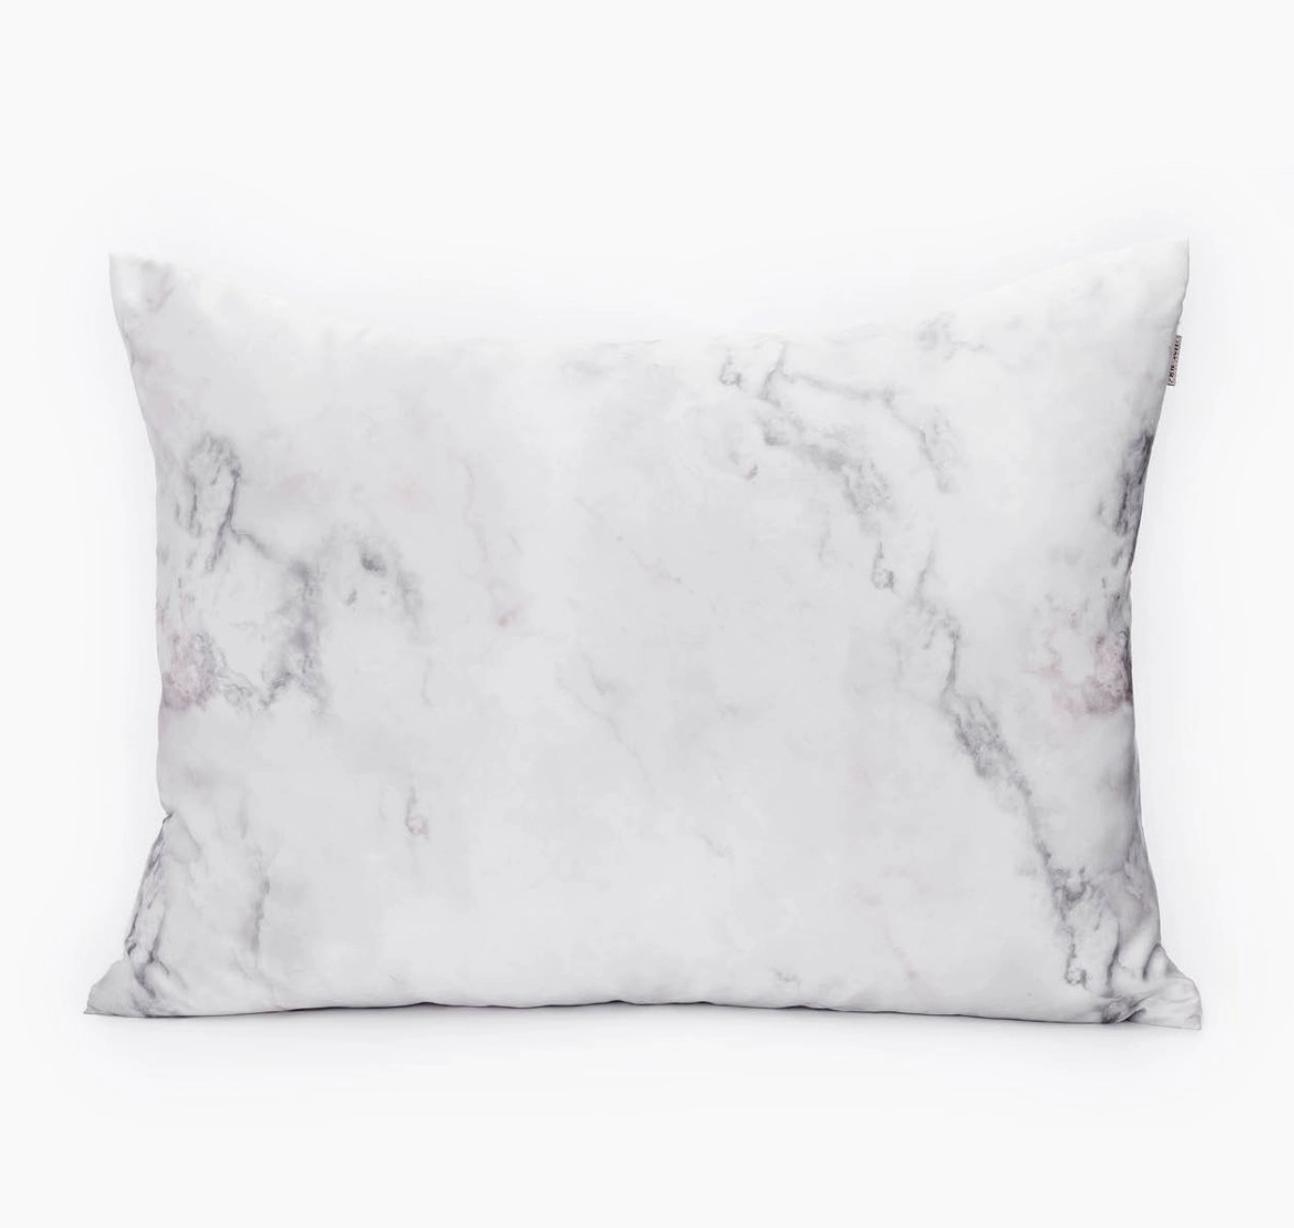 Kitsch Satin Pillowcase - Marble